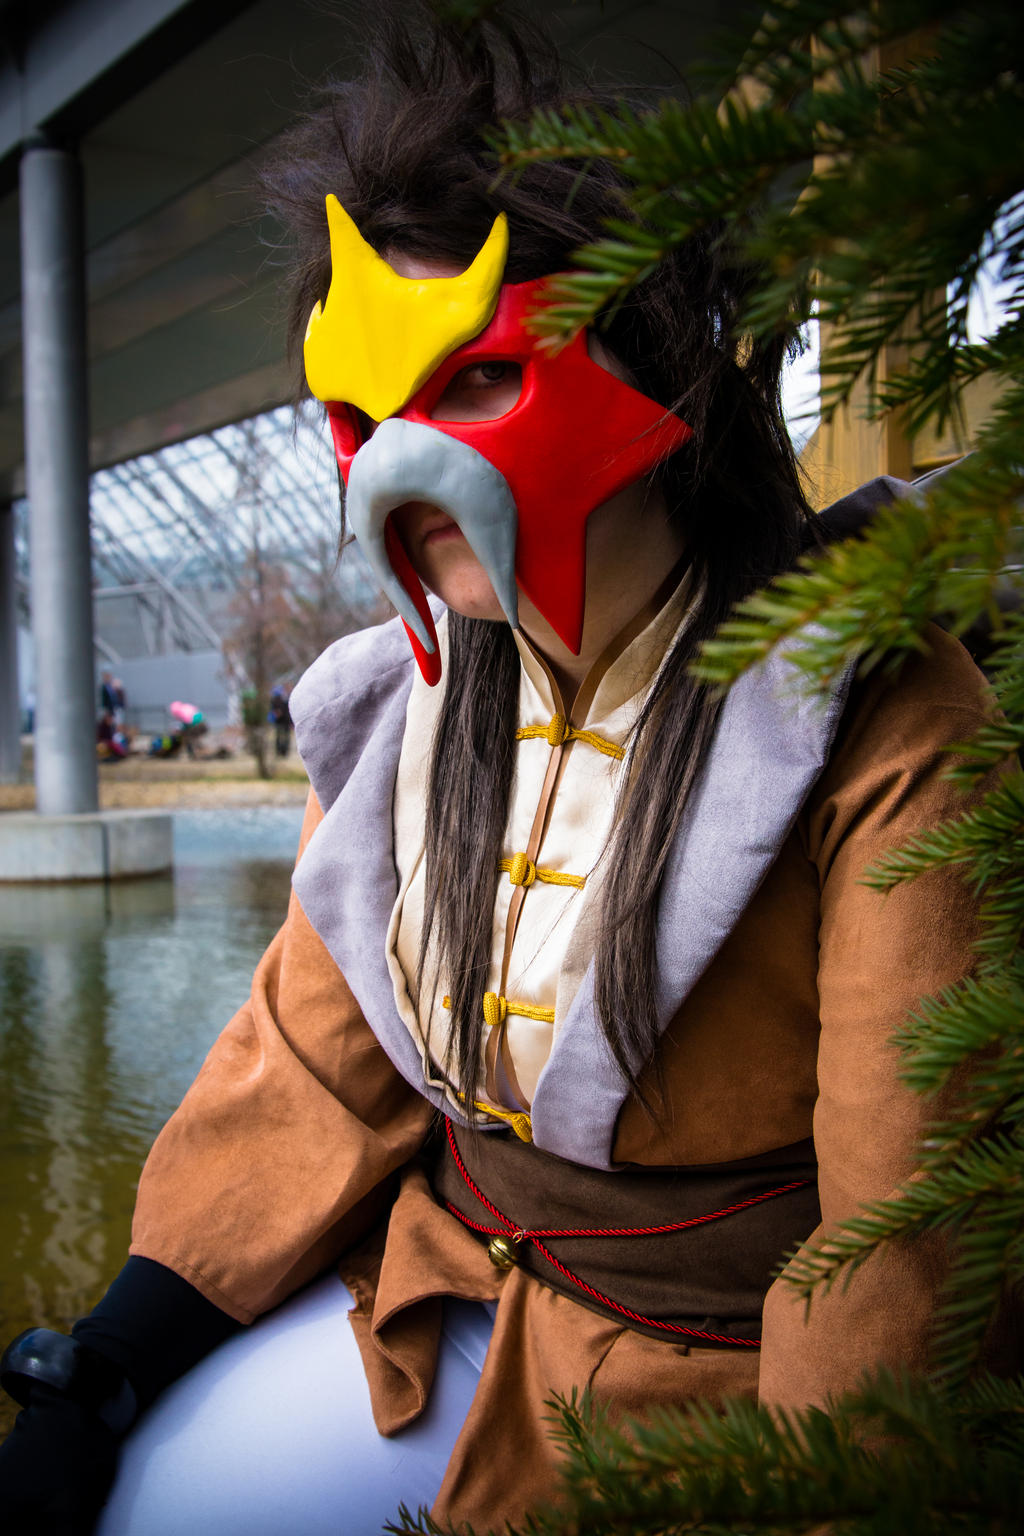 #244 Pokemon Entei Gijinka by Boldscheck - 326.4KB